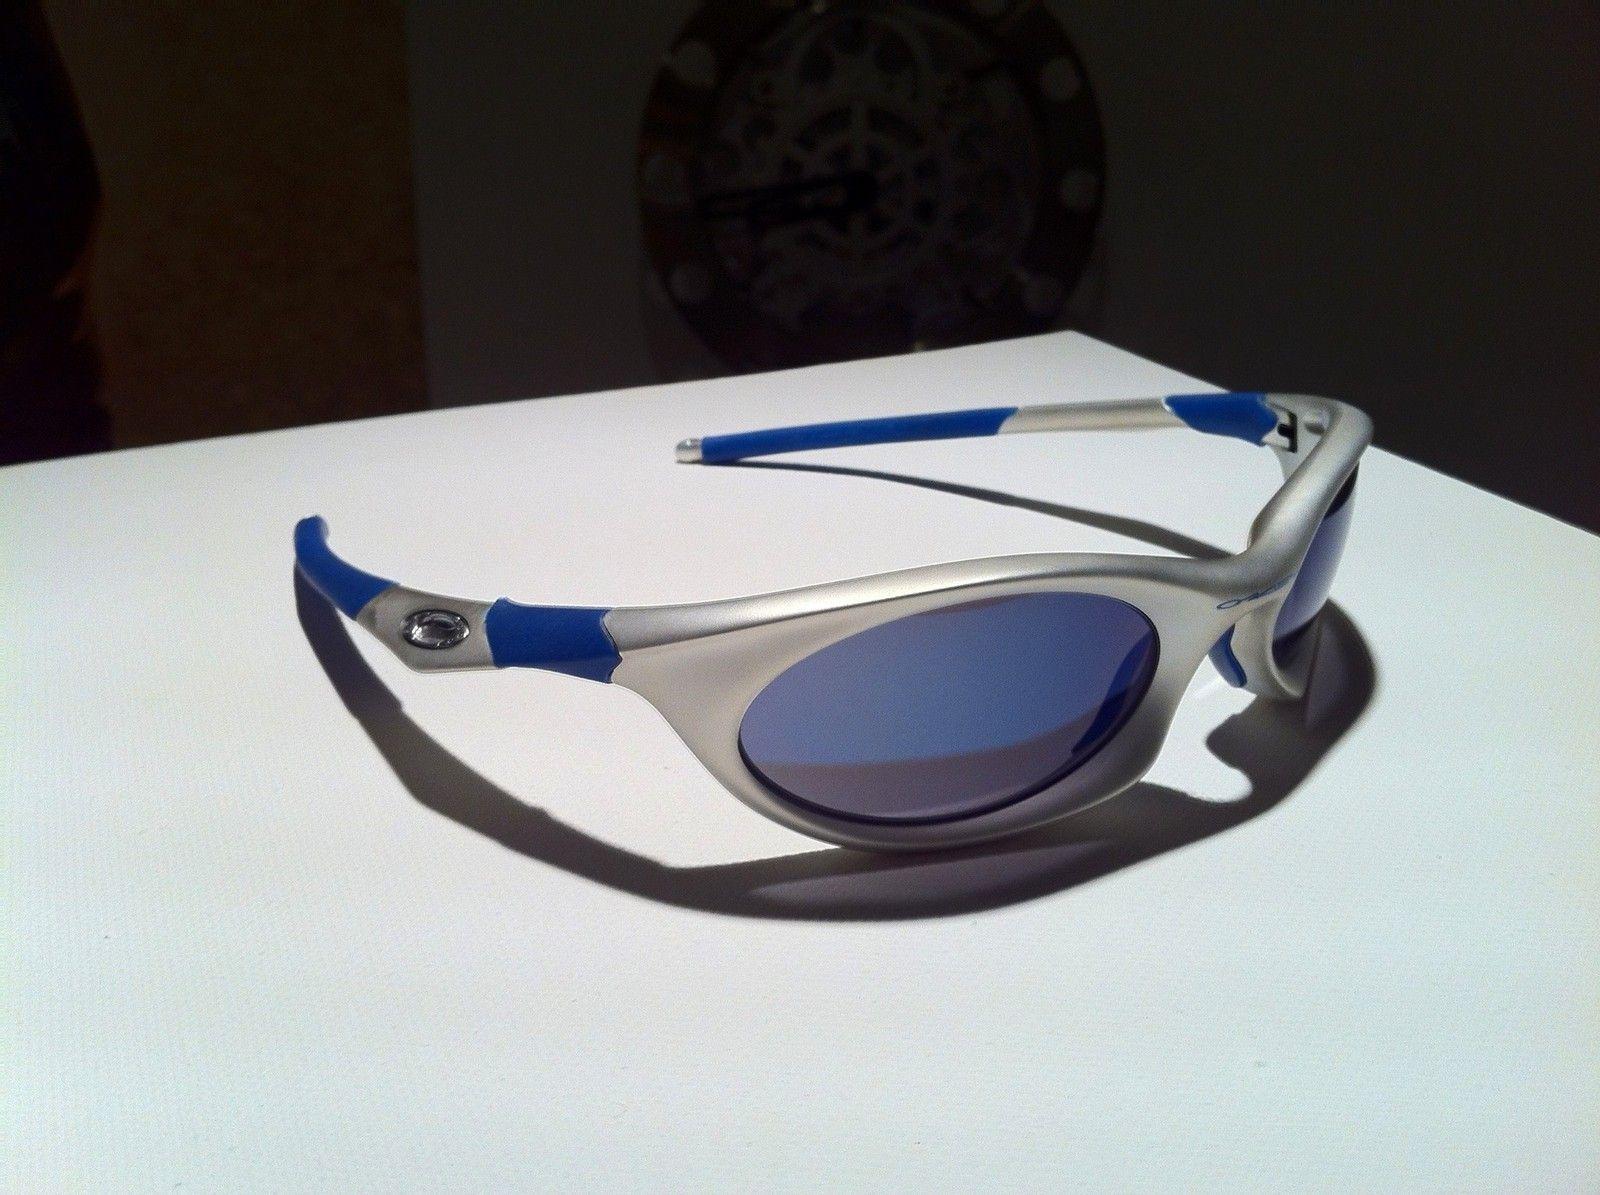 Eye Jacket 3.0 Fmj 5.56 W/ Ice Iridium - Odwxo.jpg